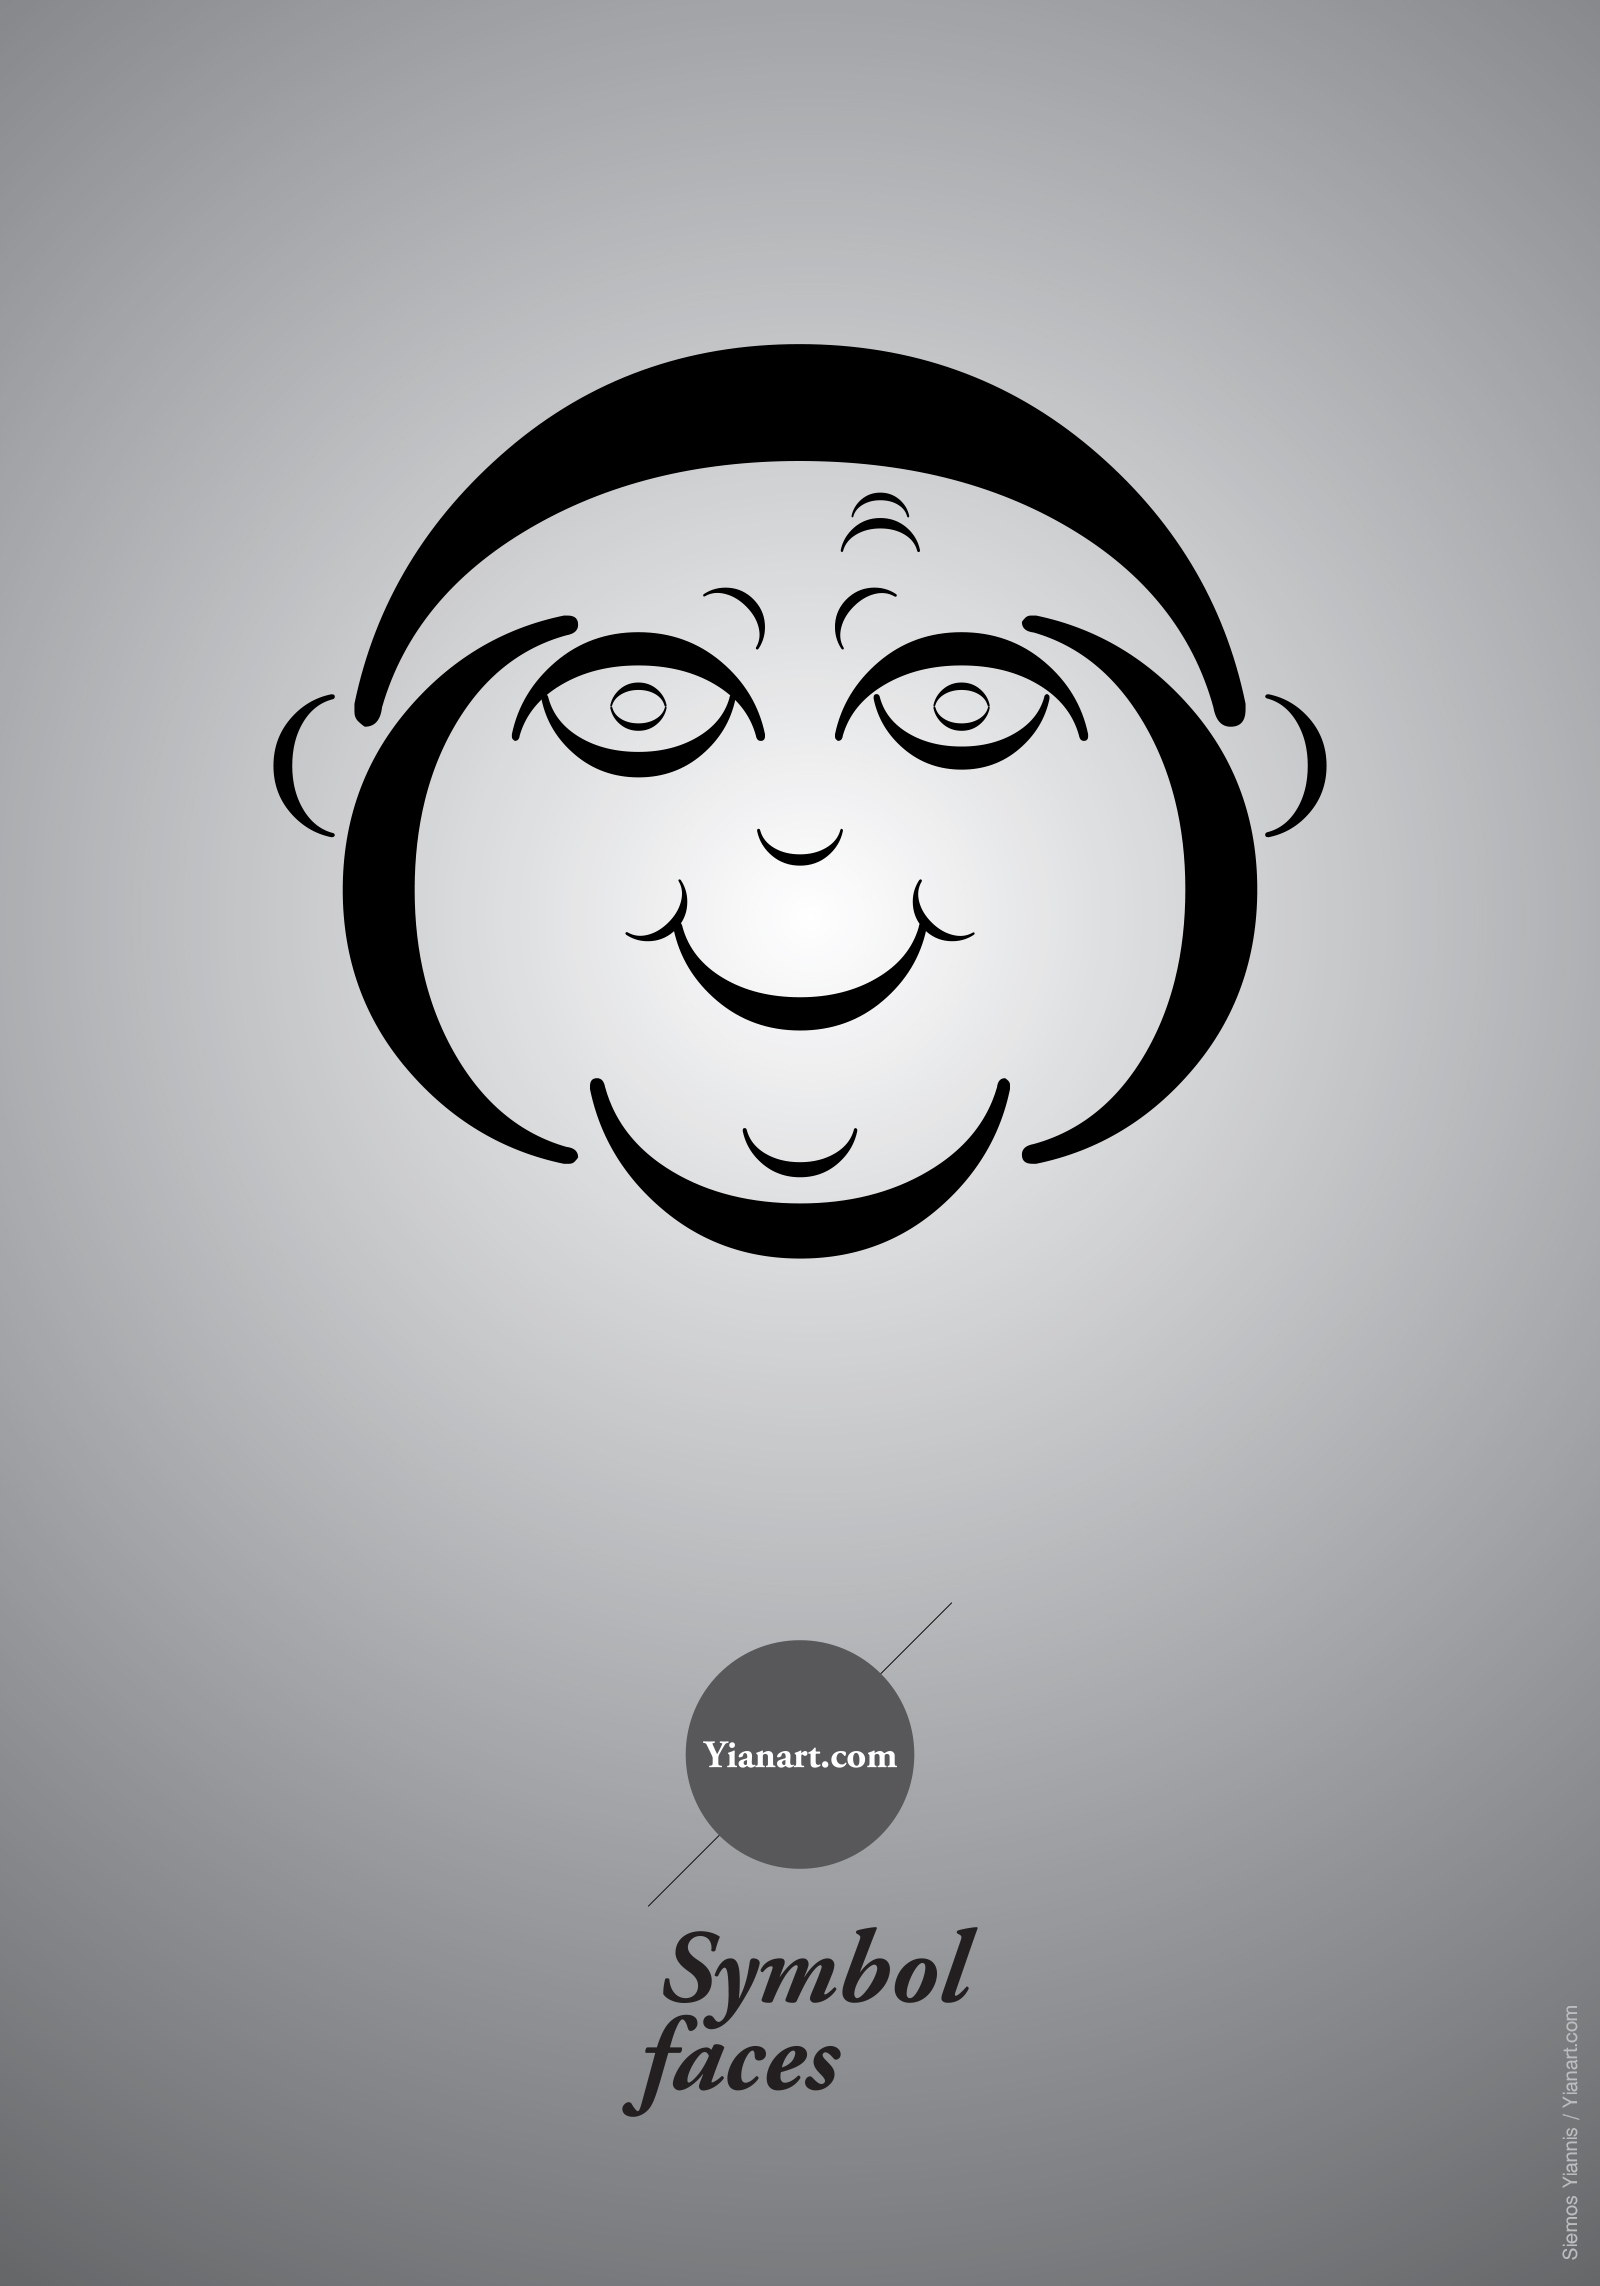 Symbol Faces_14_Yianart.com